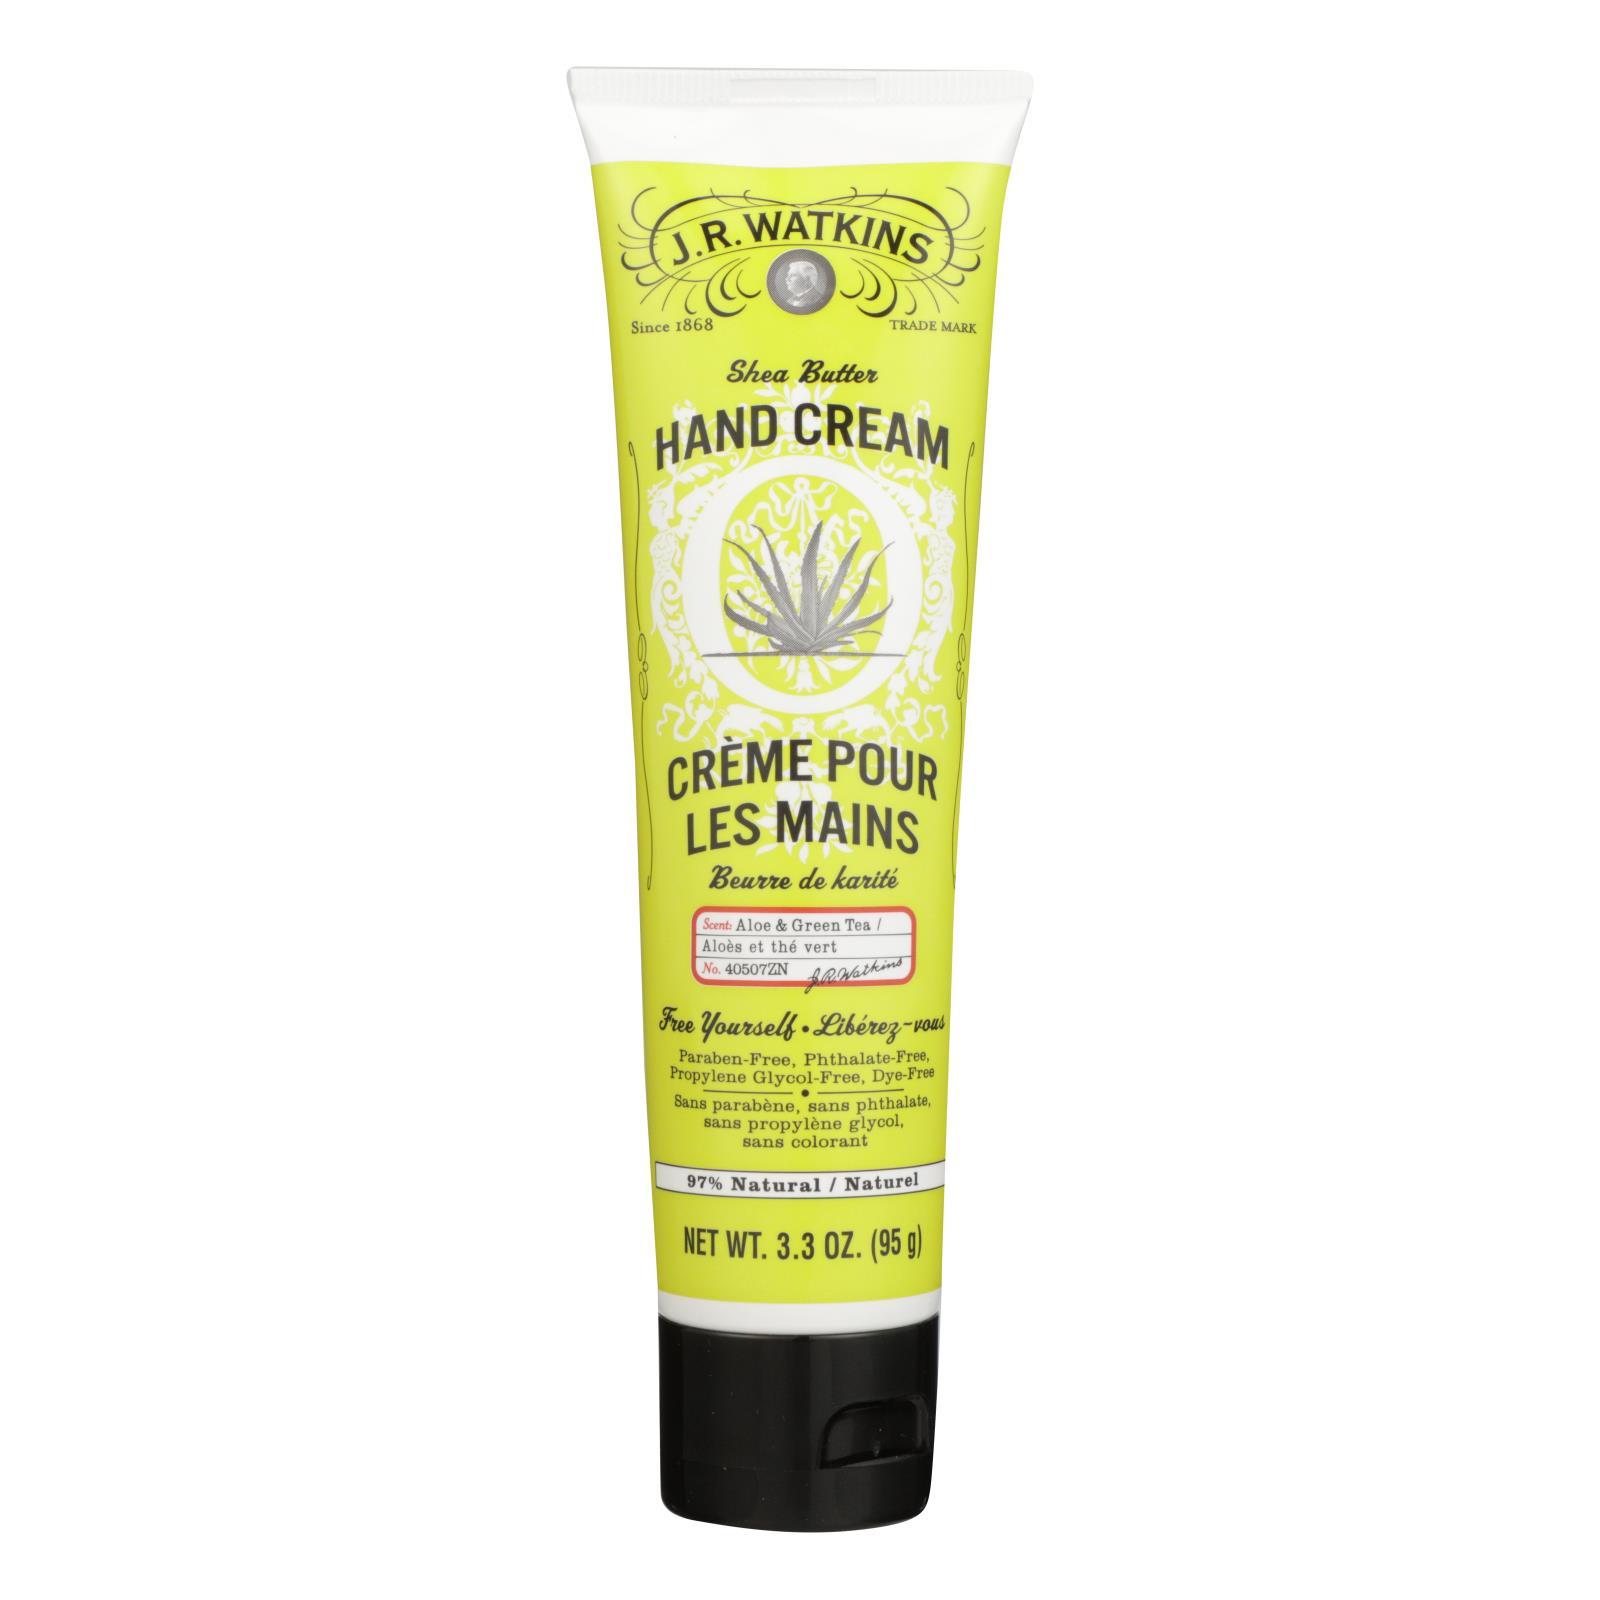 J.R. Watkins Shea Butter Hand Cream Aloe and Green Tea - 3.3 oz